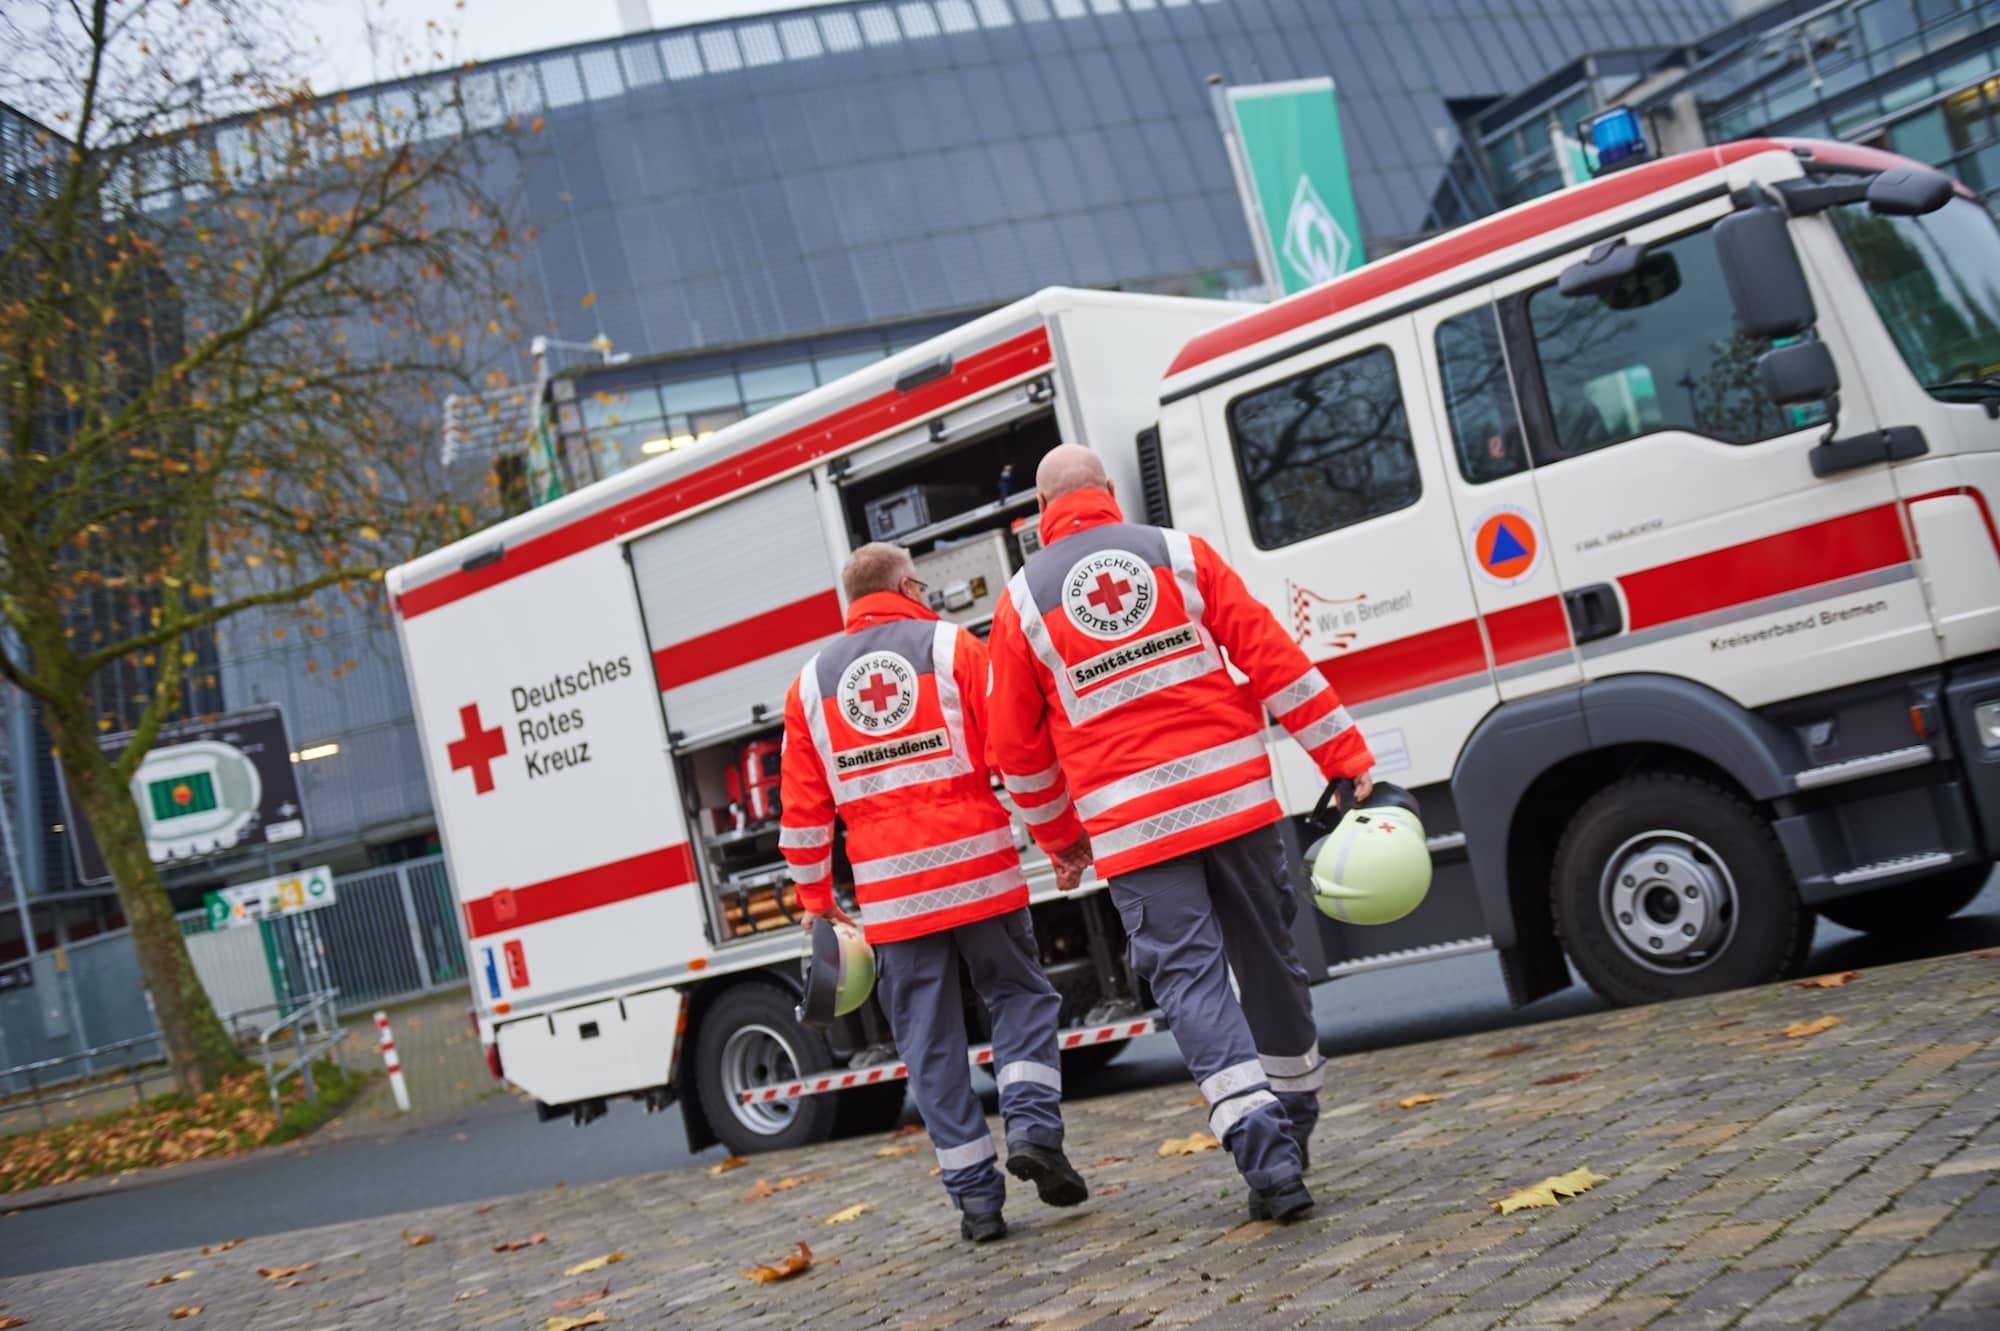 Deutsches rotes Kreuz Bremen Katastrophenschutz